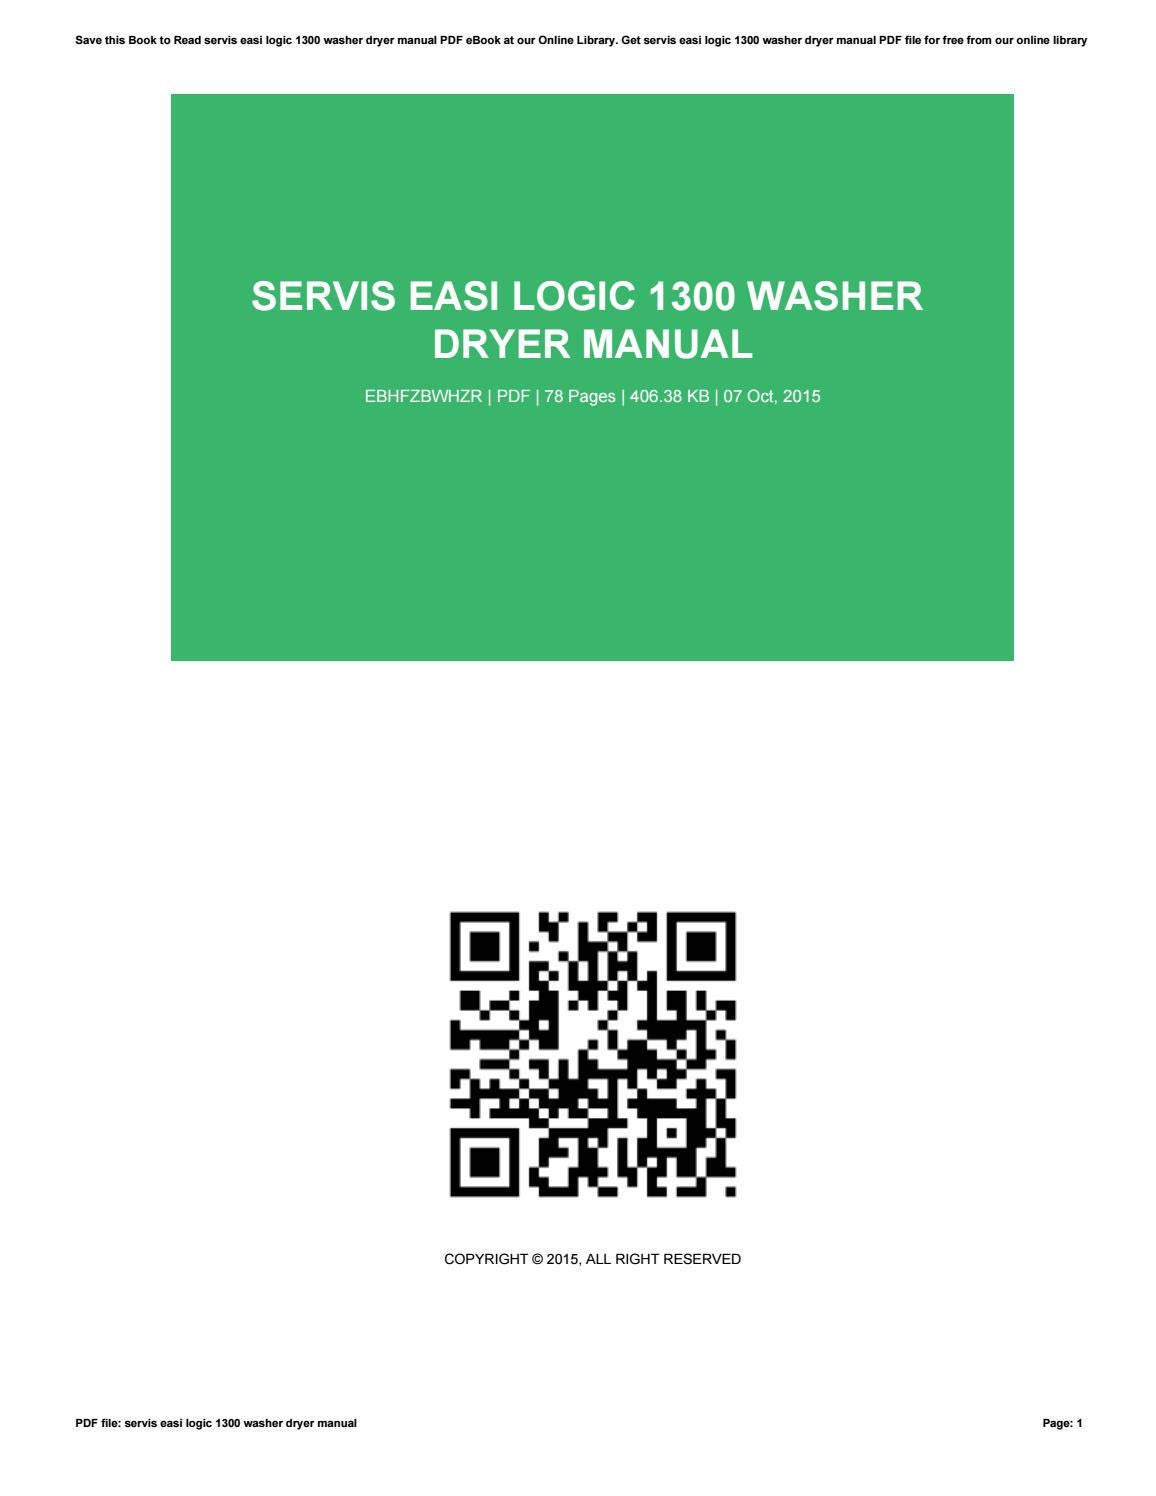 Servis easi logic 1300 user manual by carlamayfield2598 issuu.